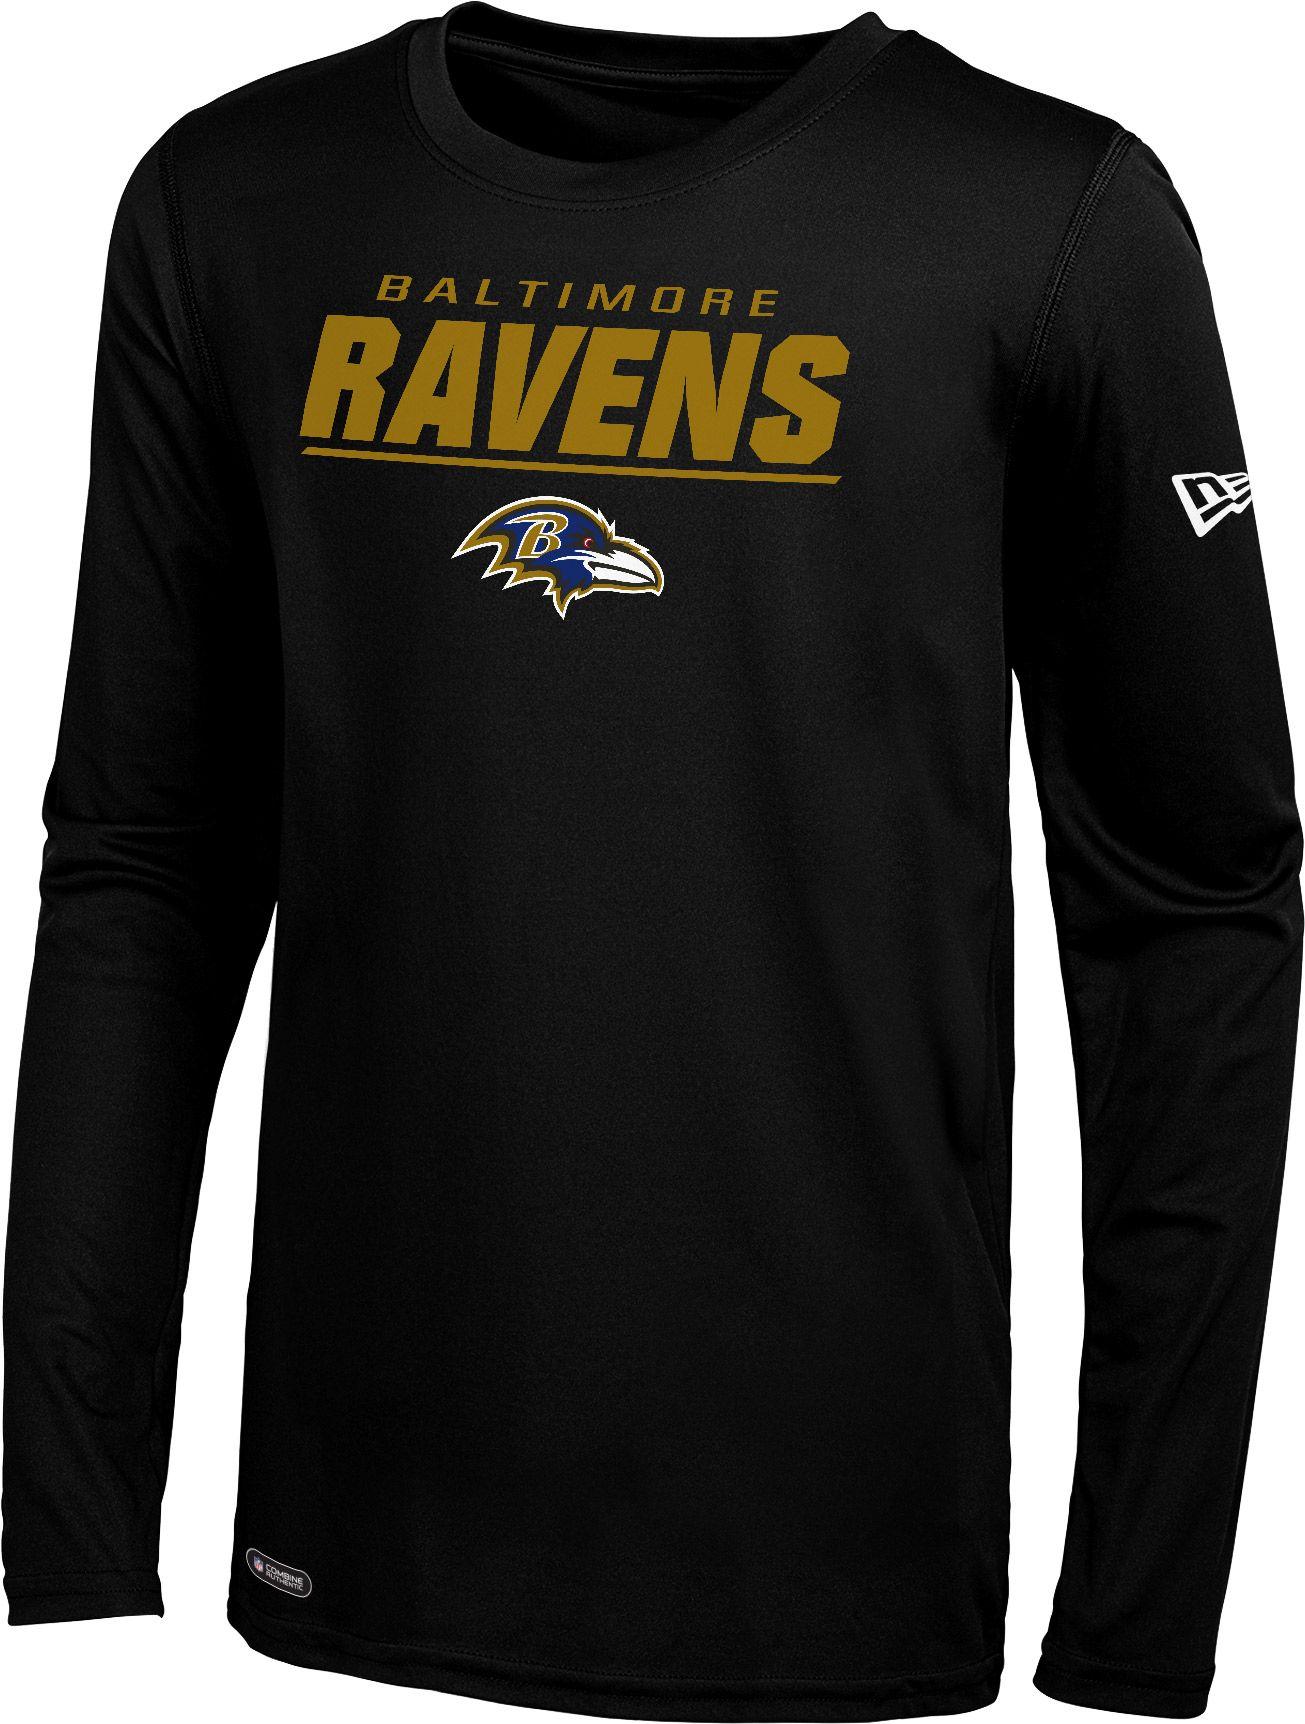 ravens long sleeve shirt